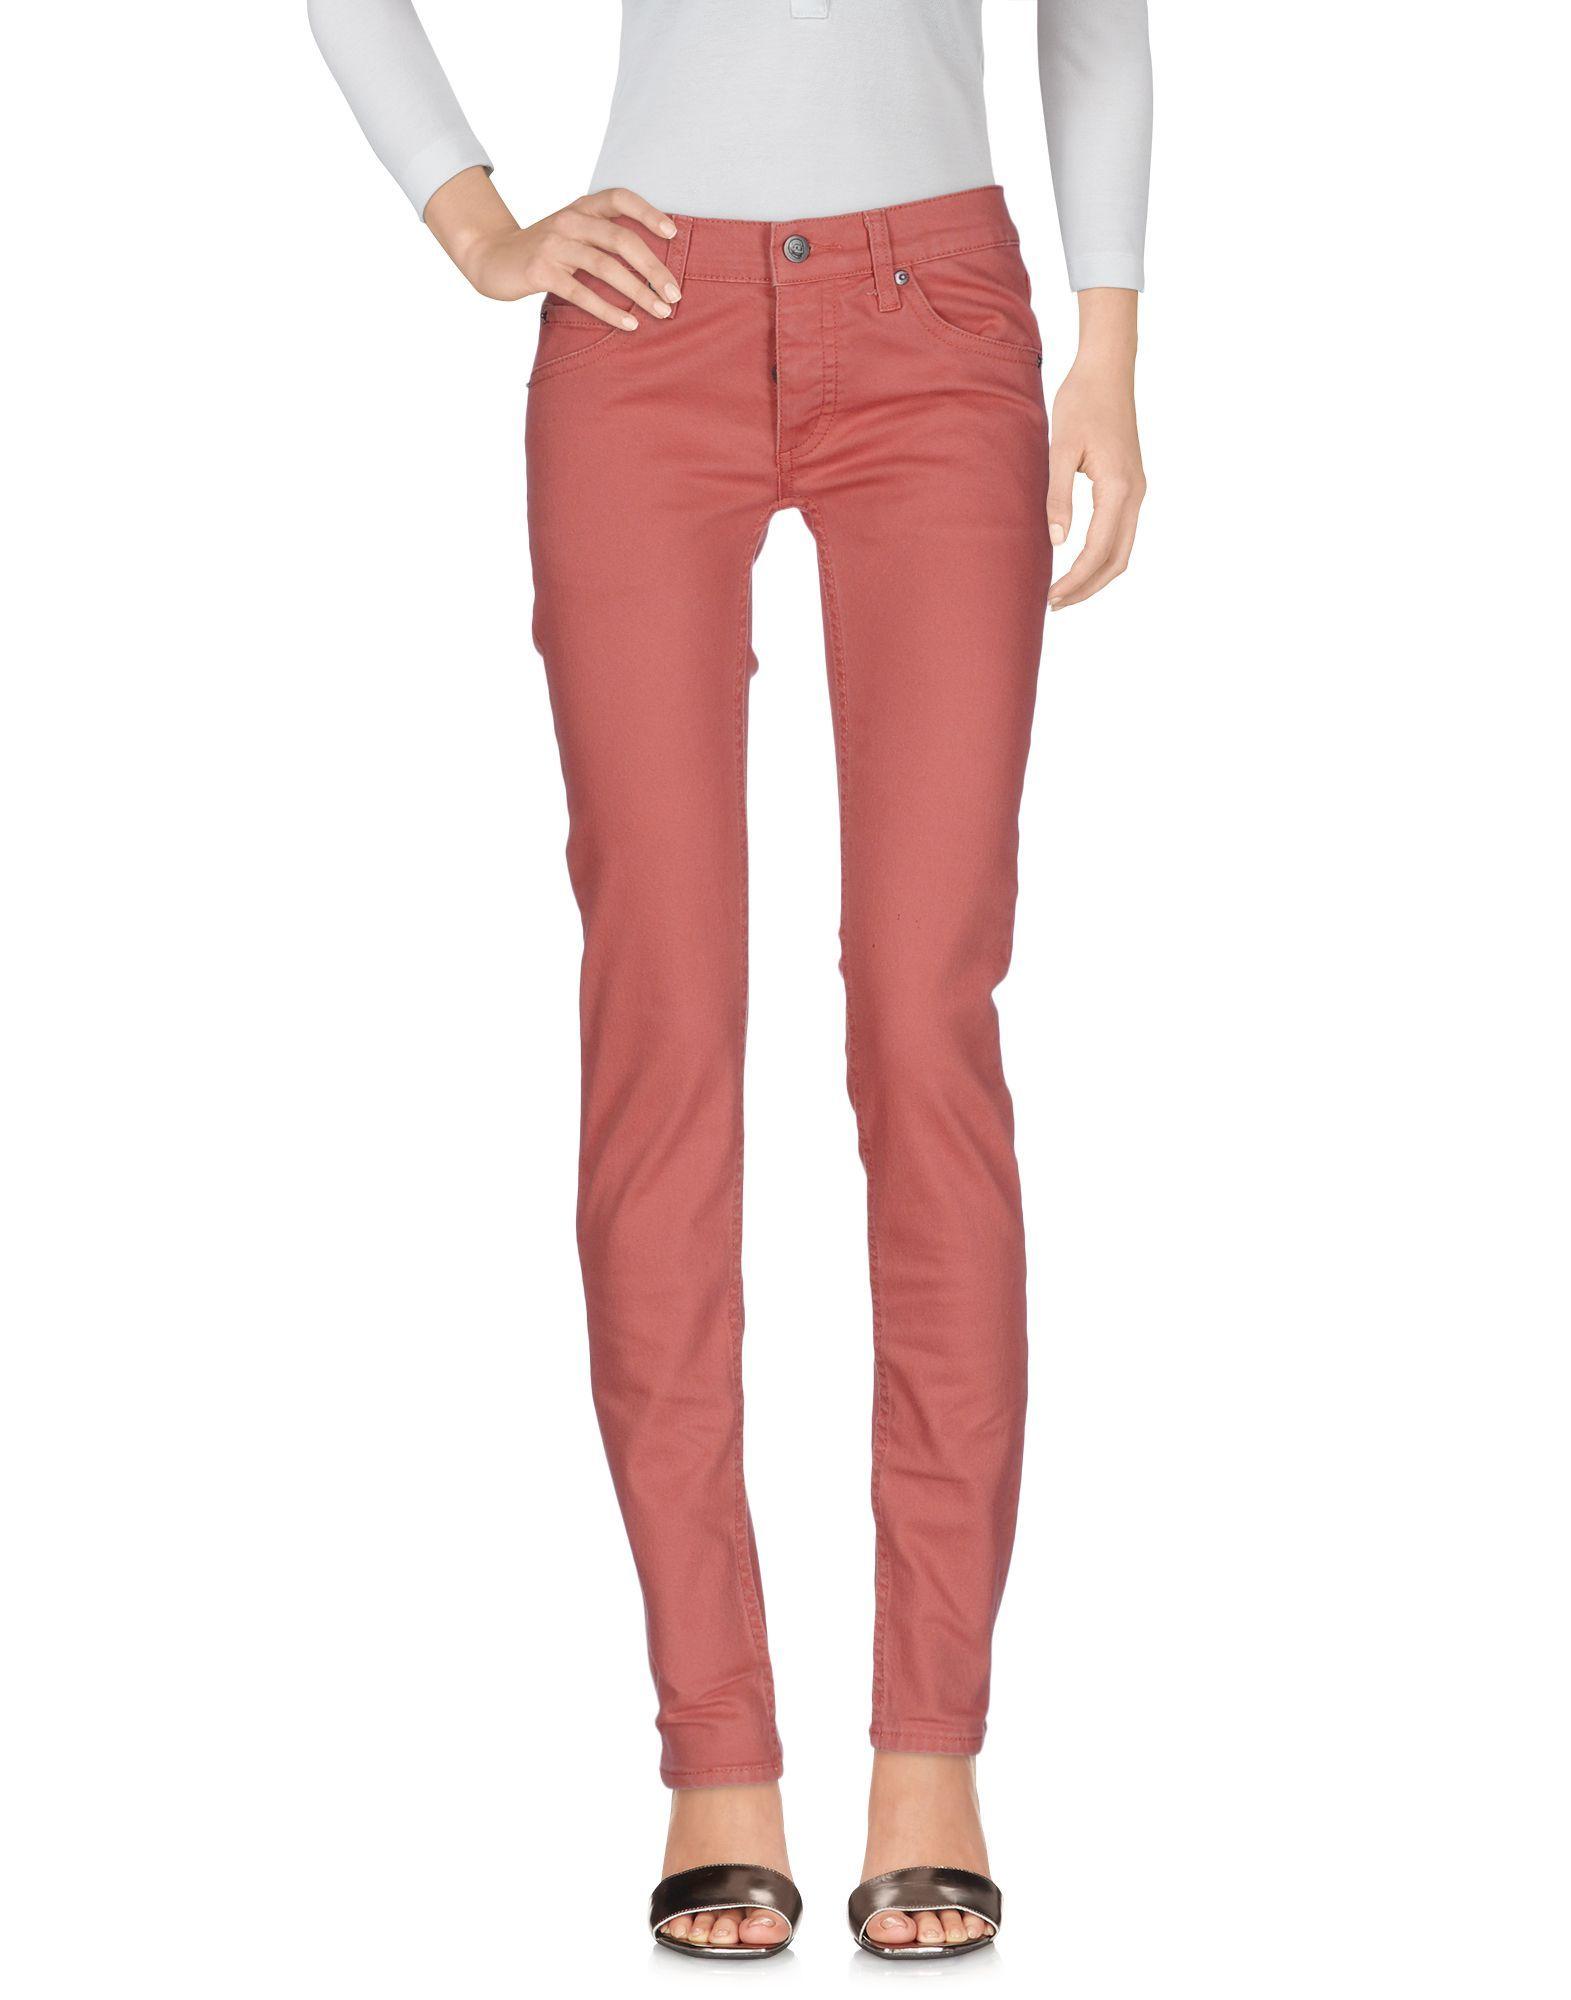 Cheap Monday Brick Red Cotton Jeans